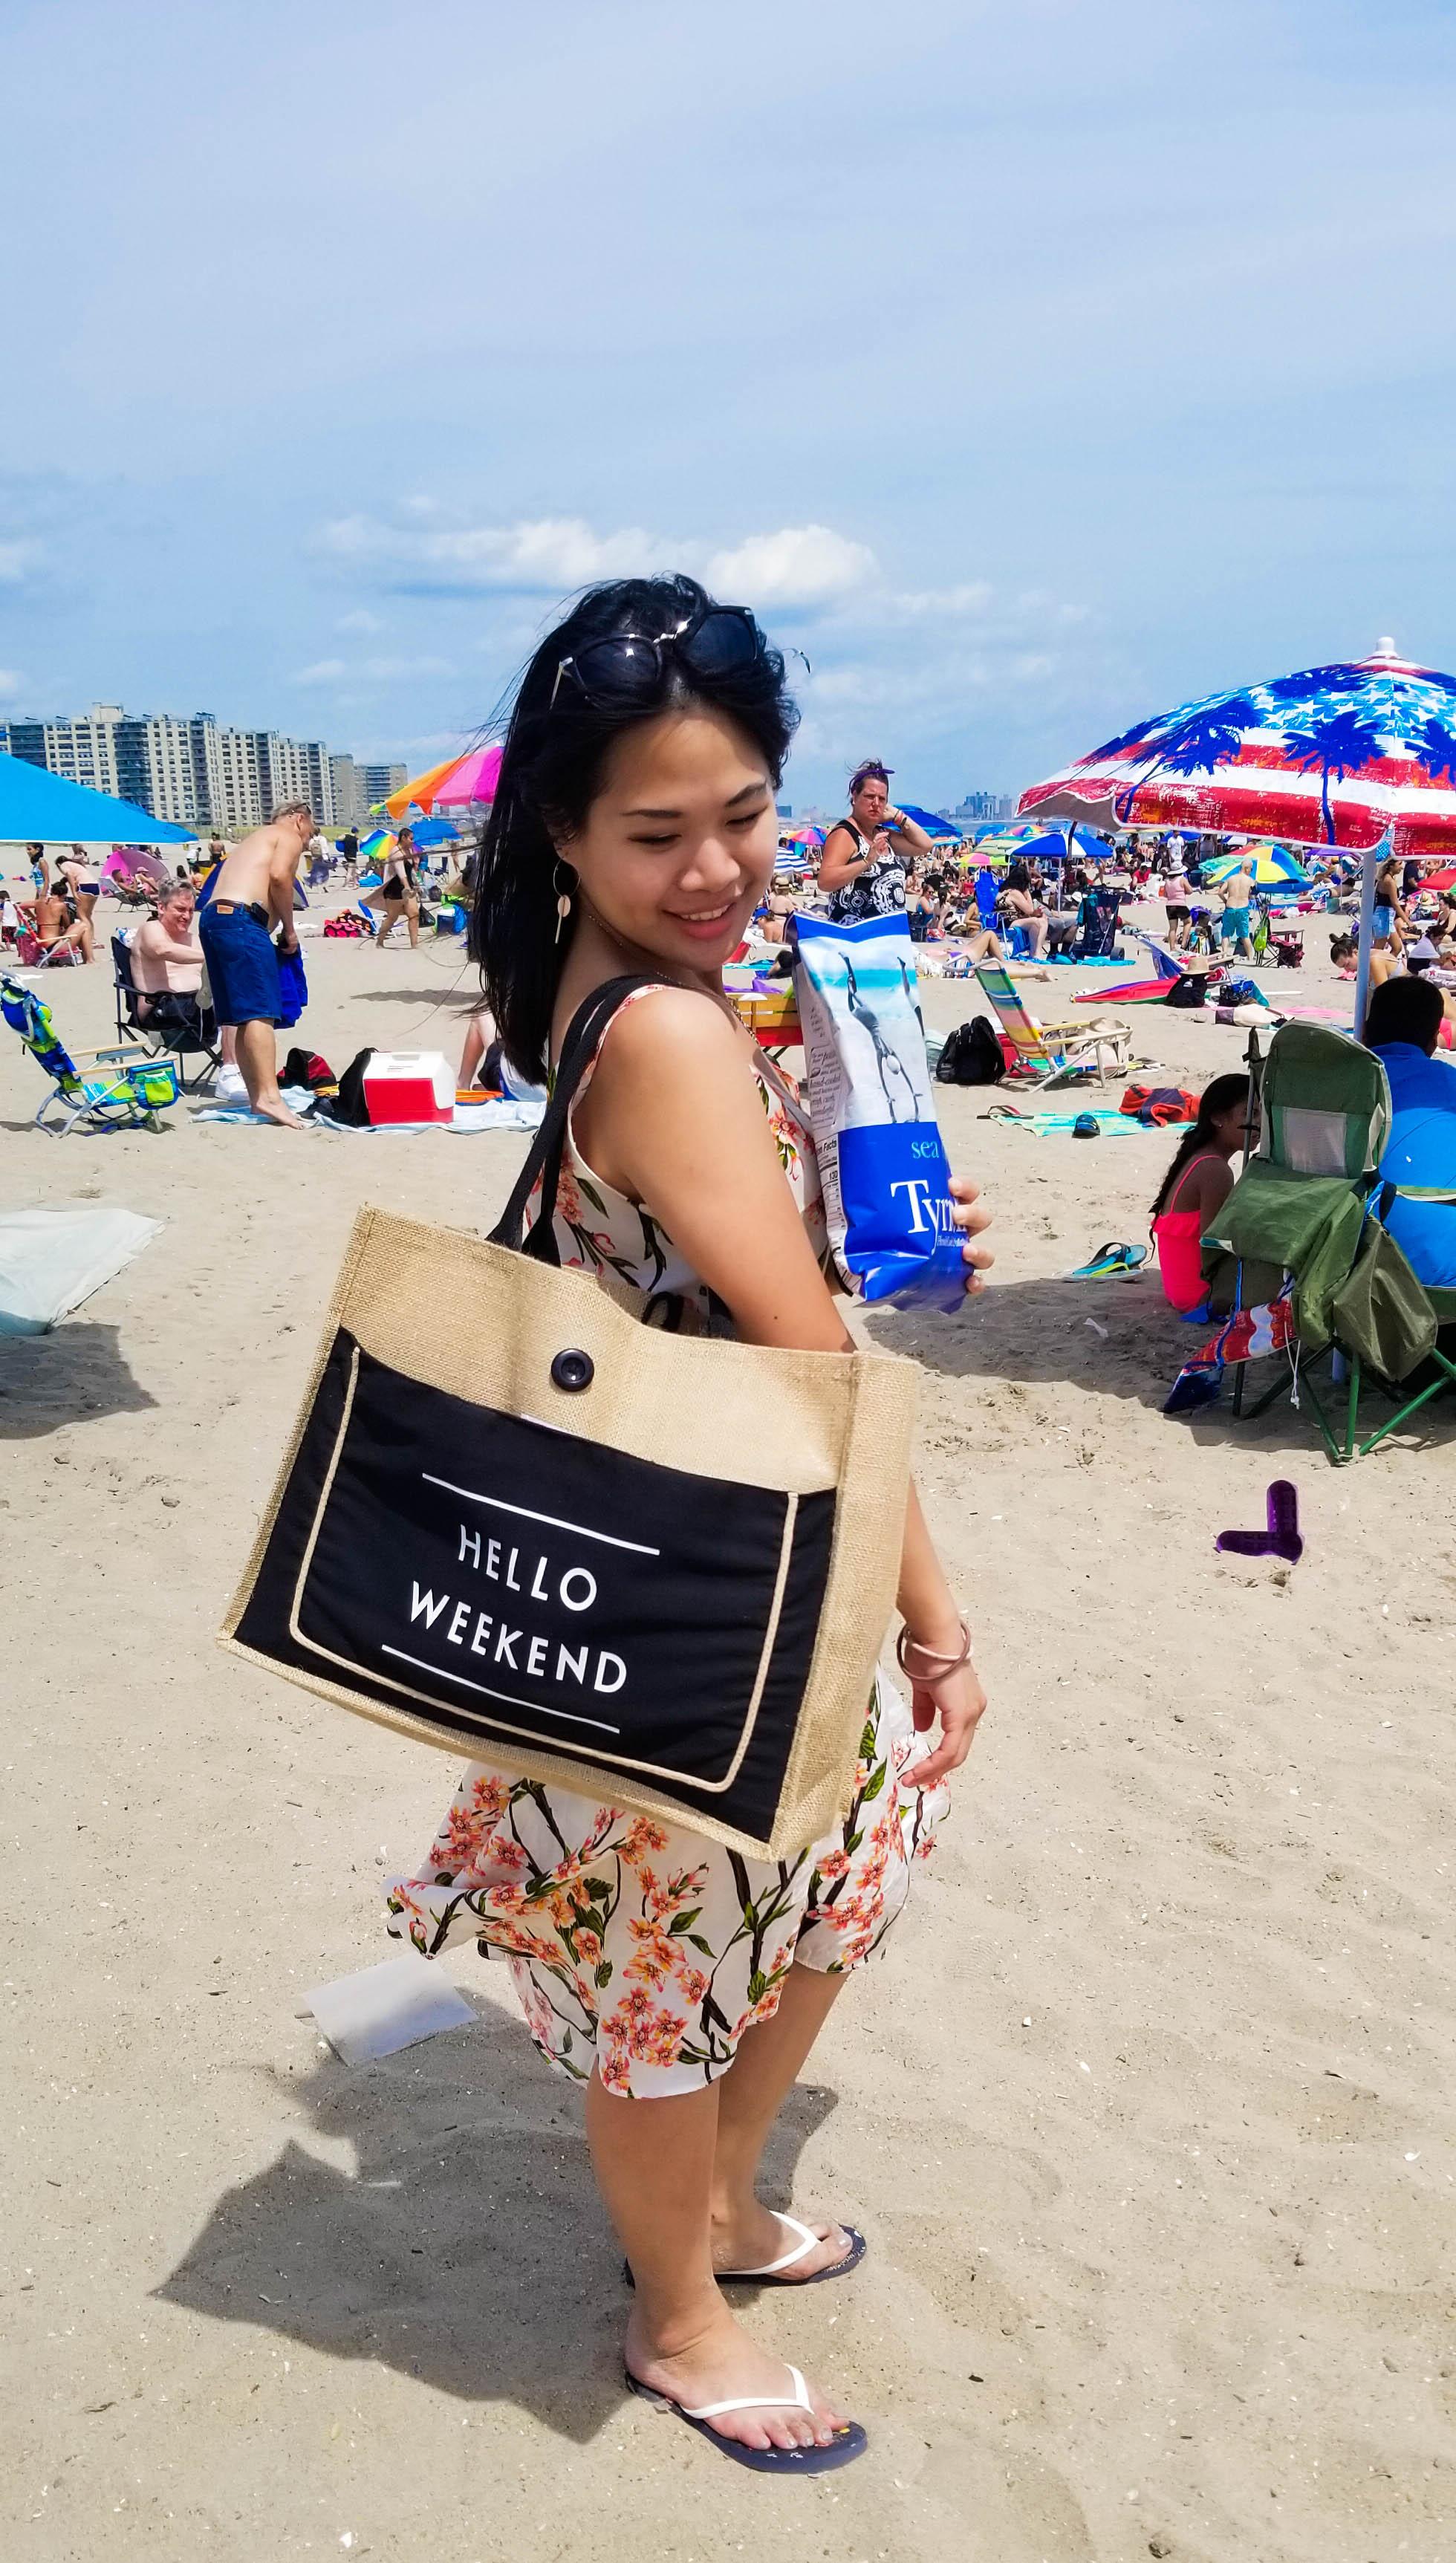 beaches in new york far rockaway queens new york city